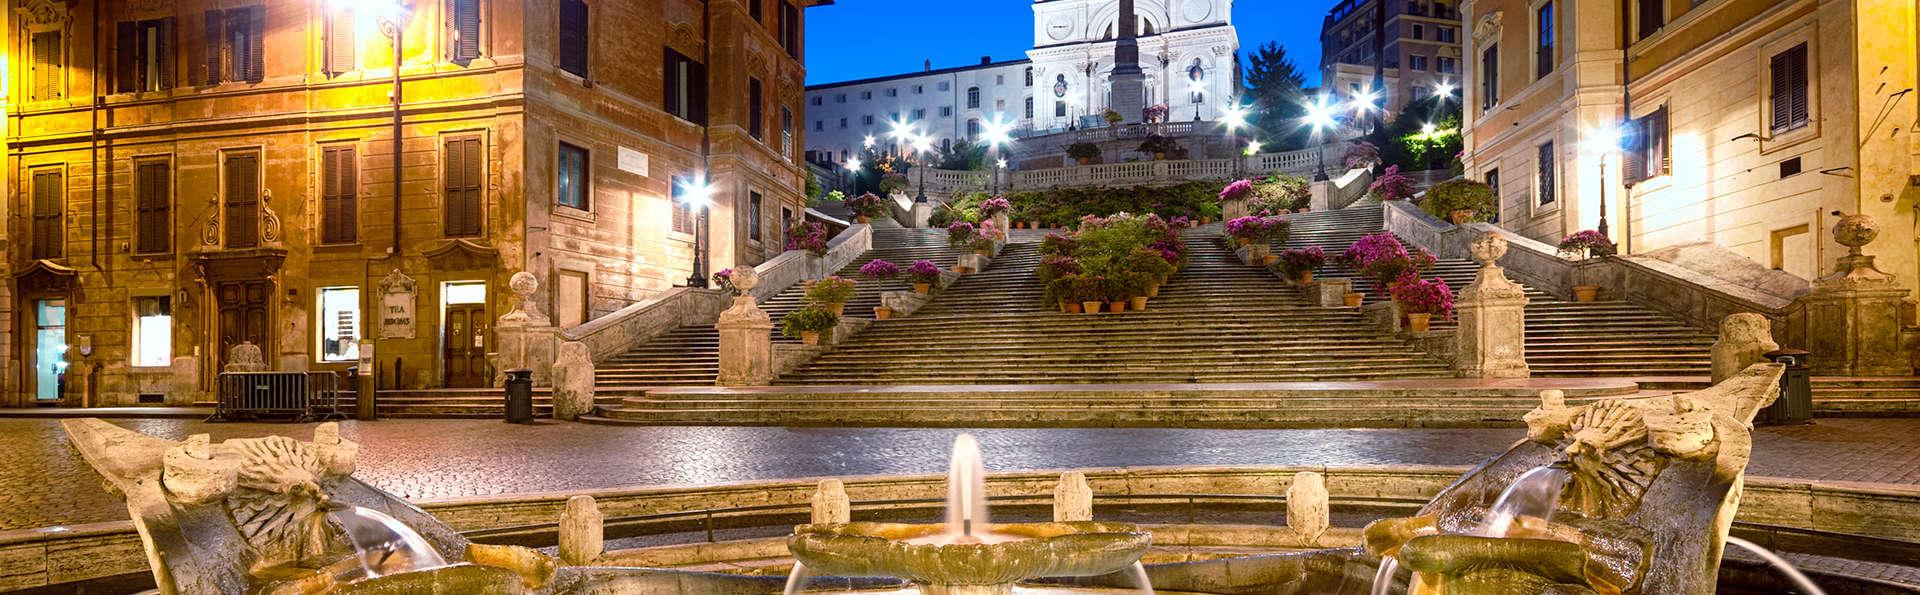 Hotel Apogia Lloyd Roma - Edit_Piazza-di-Spagna-2.jpg